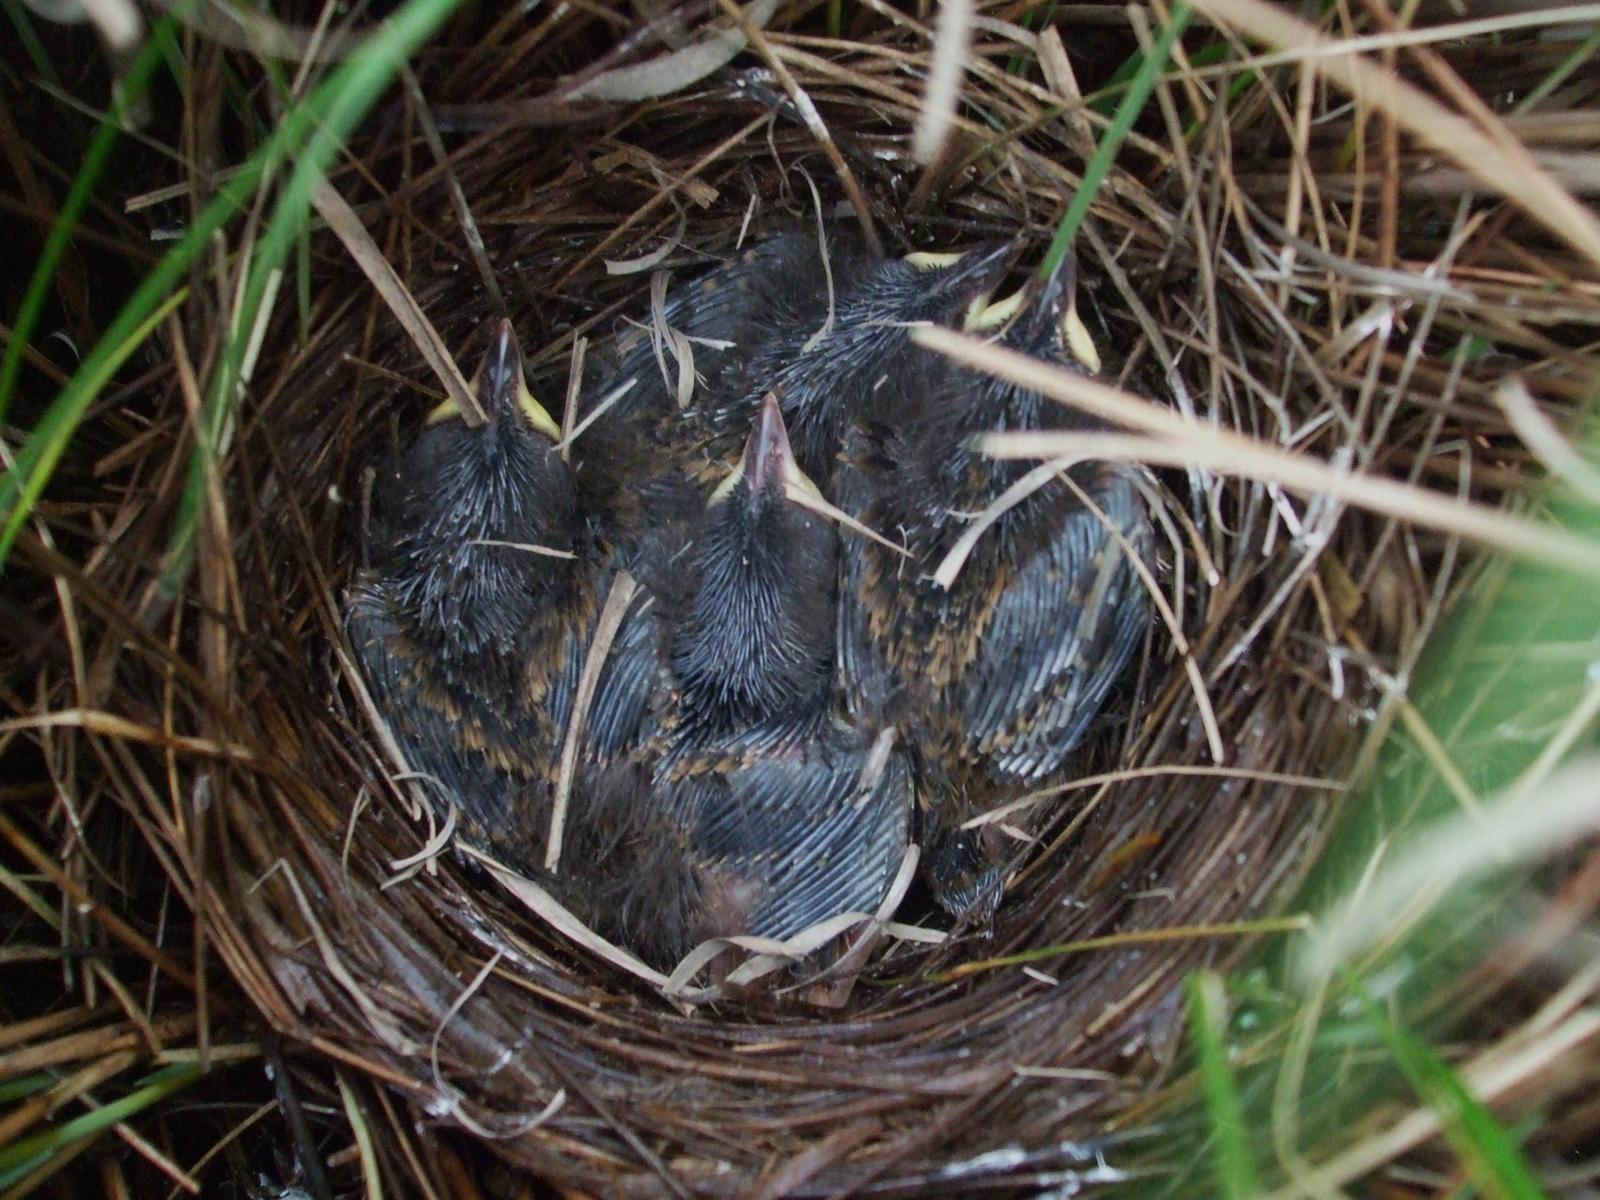 Saltmarsh Sparrow Photo by Zak Poulton